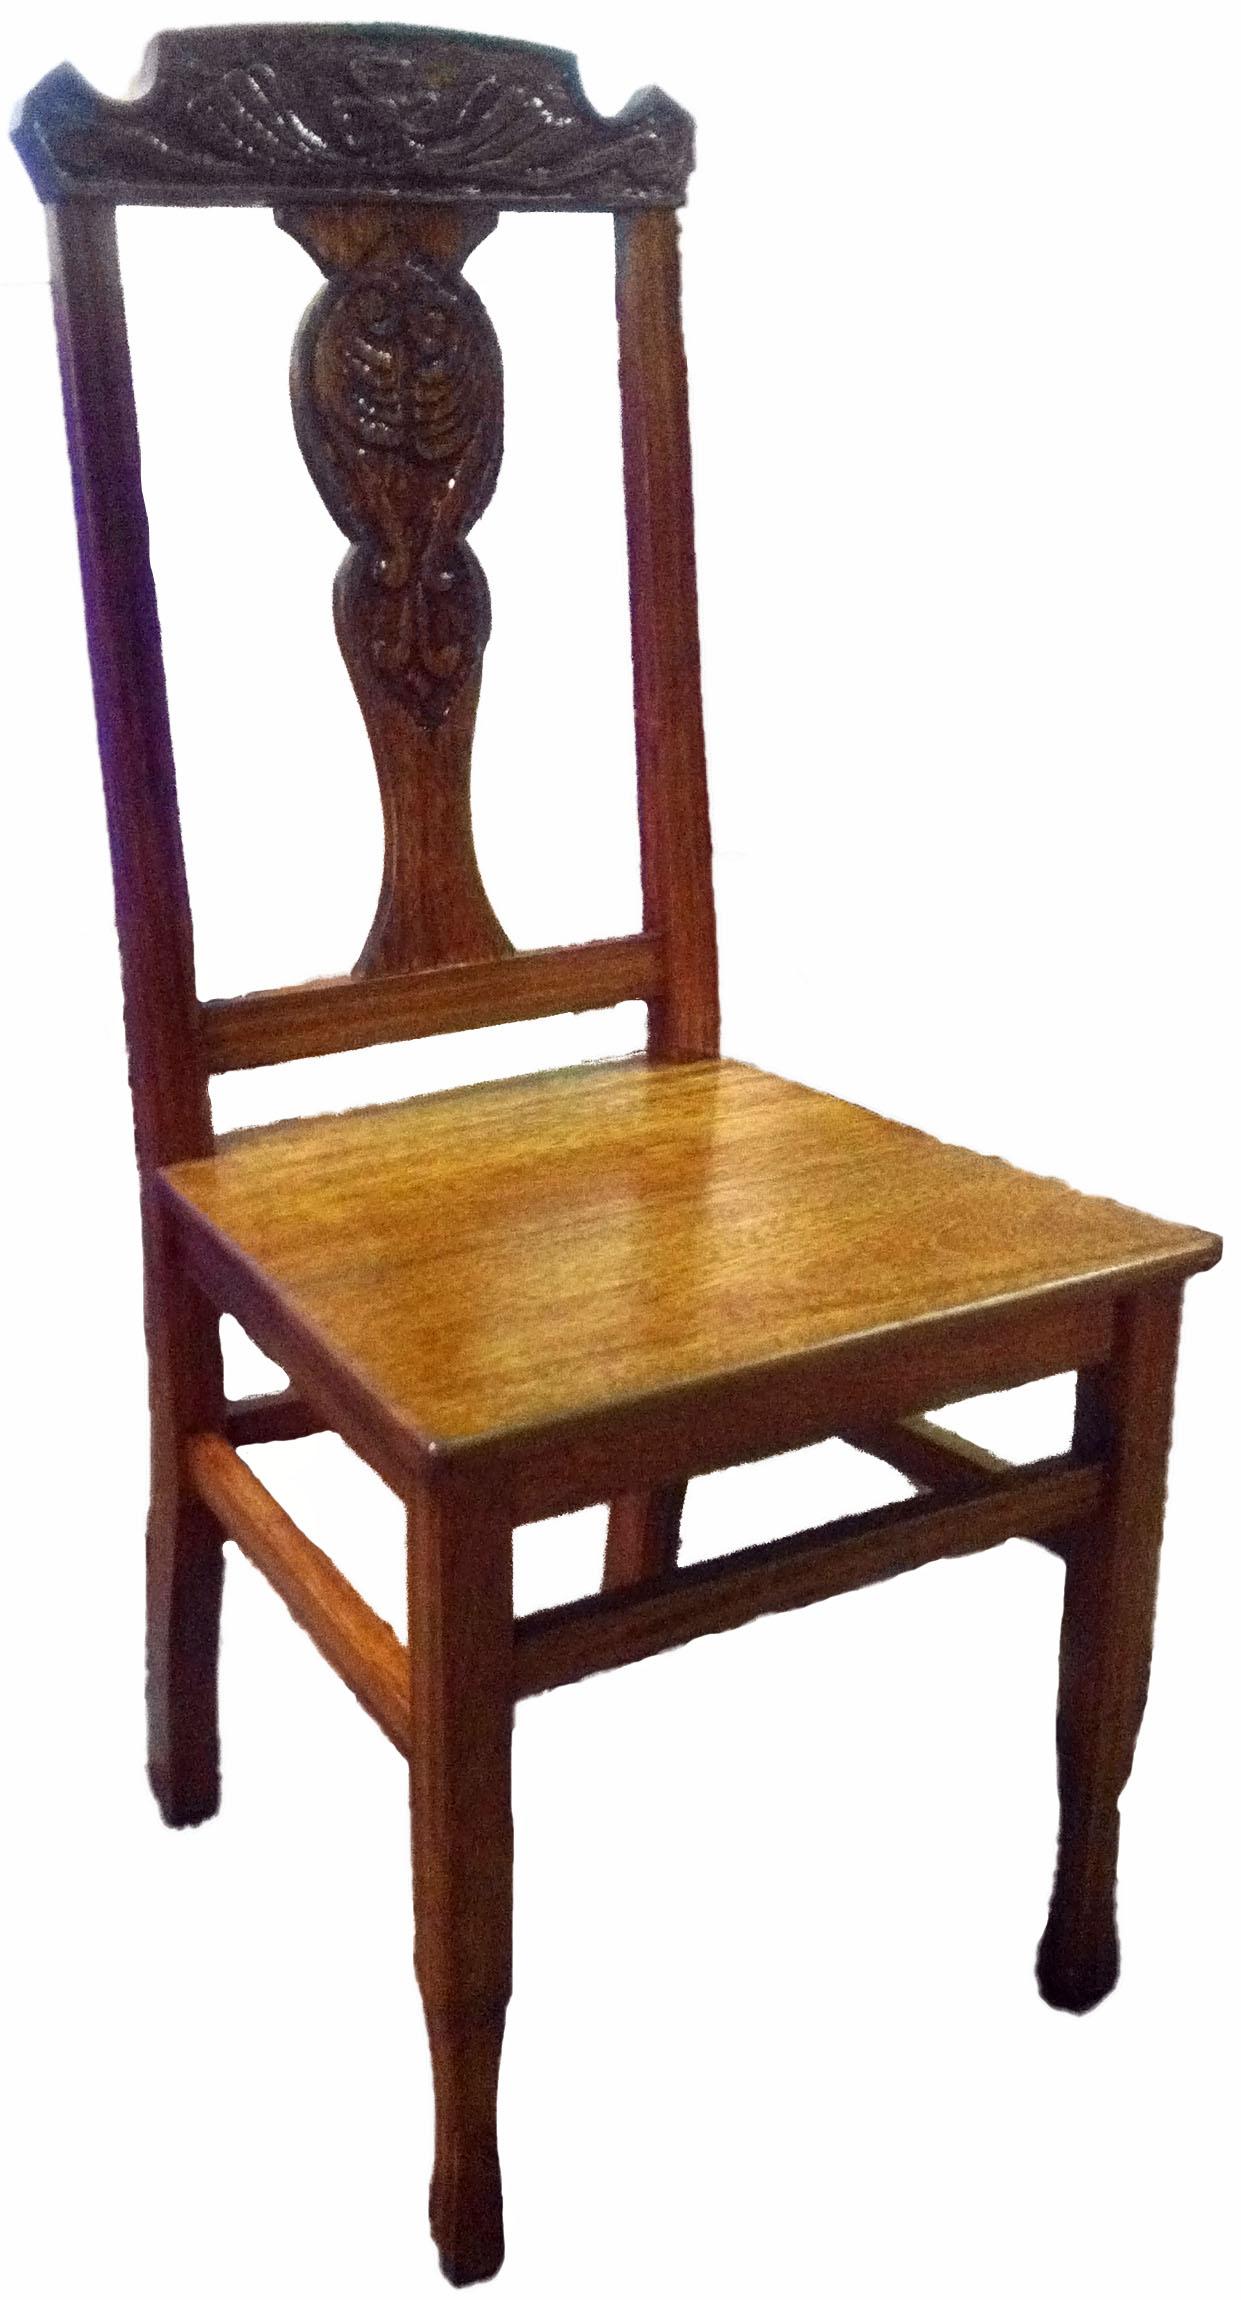 Sillas antiguas y modernas carpinteria restauracion for Modelos de sillas clasicas